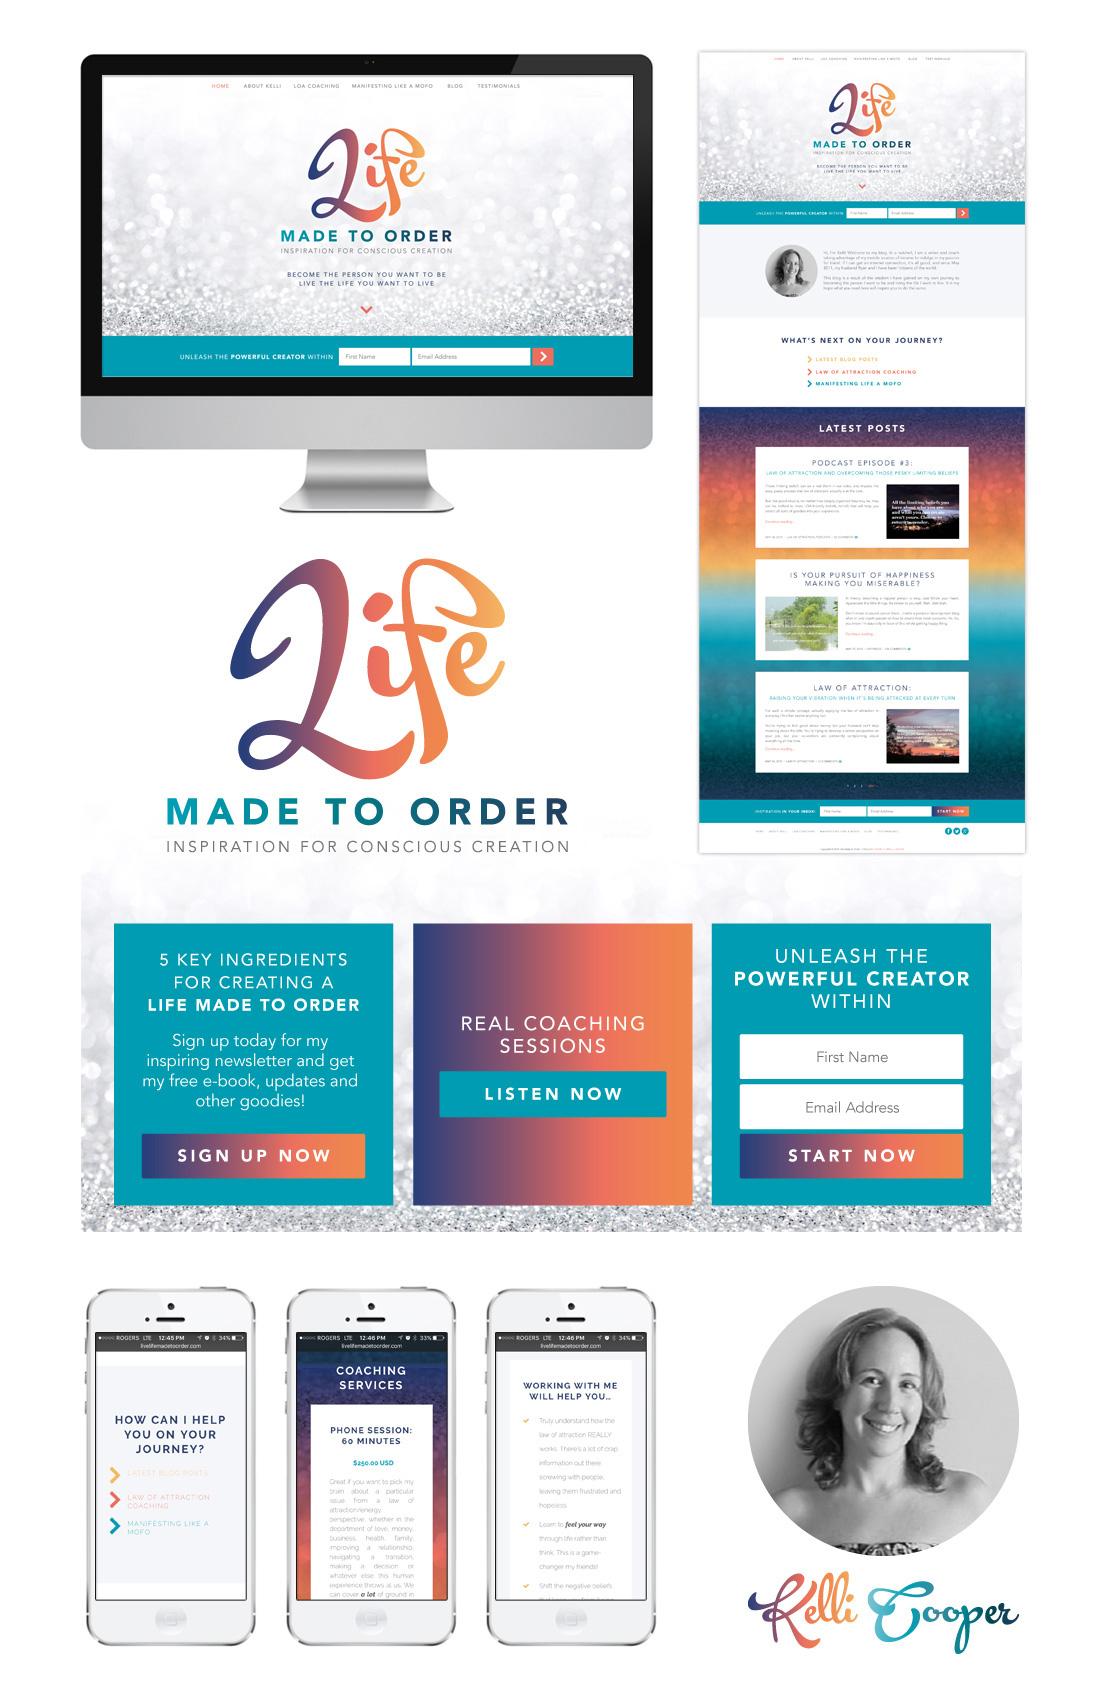 life-made-to-order-winnipeg-responsive-website-design-branding-boards